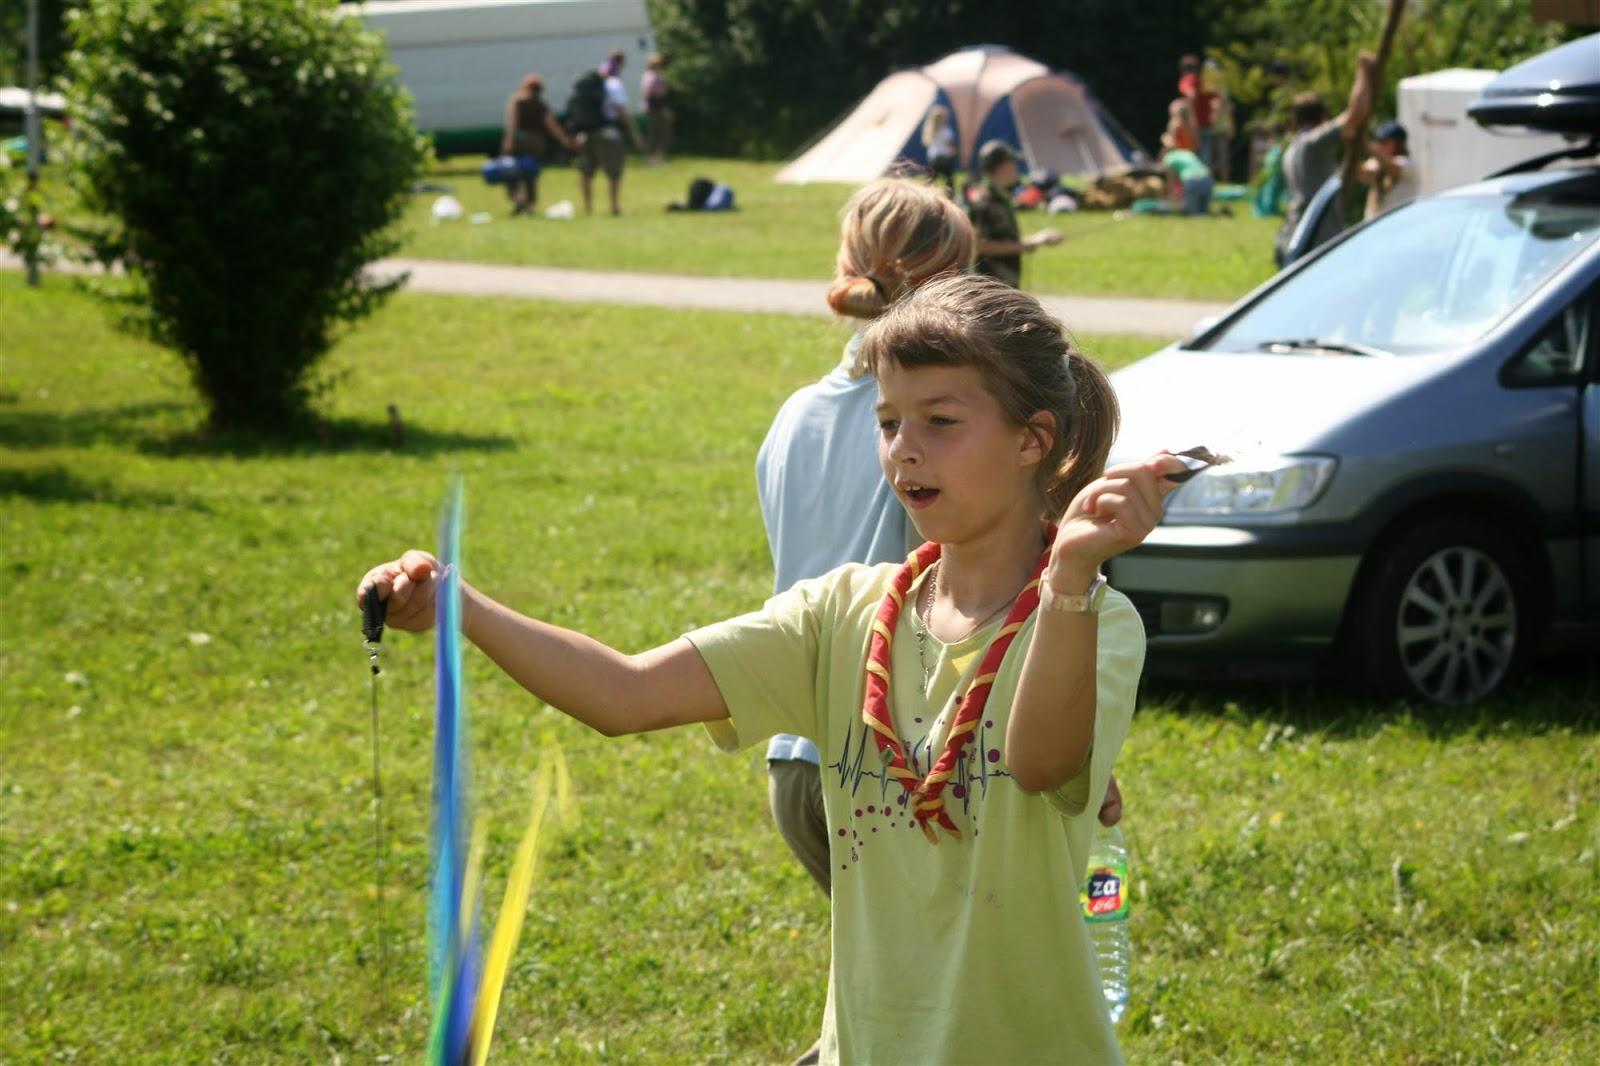 Državni mnogoboj, Velenje 2007 - IMG_8765.jpg